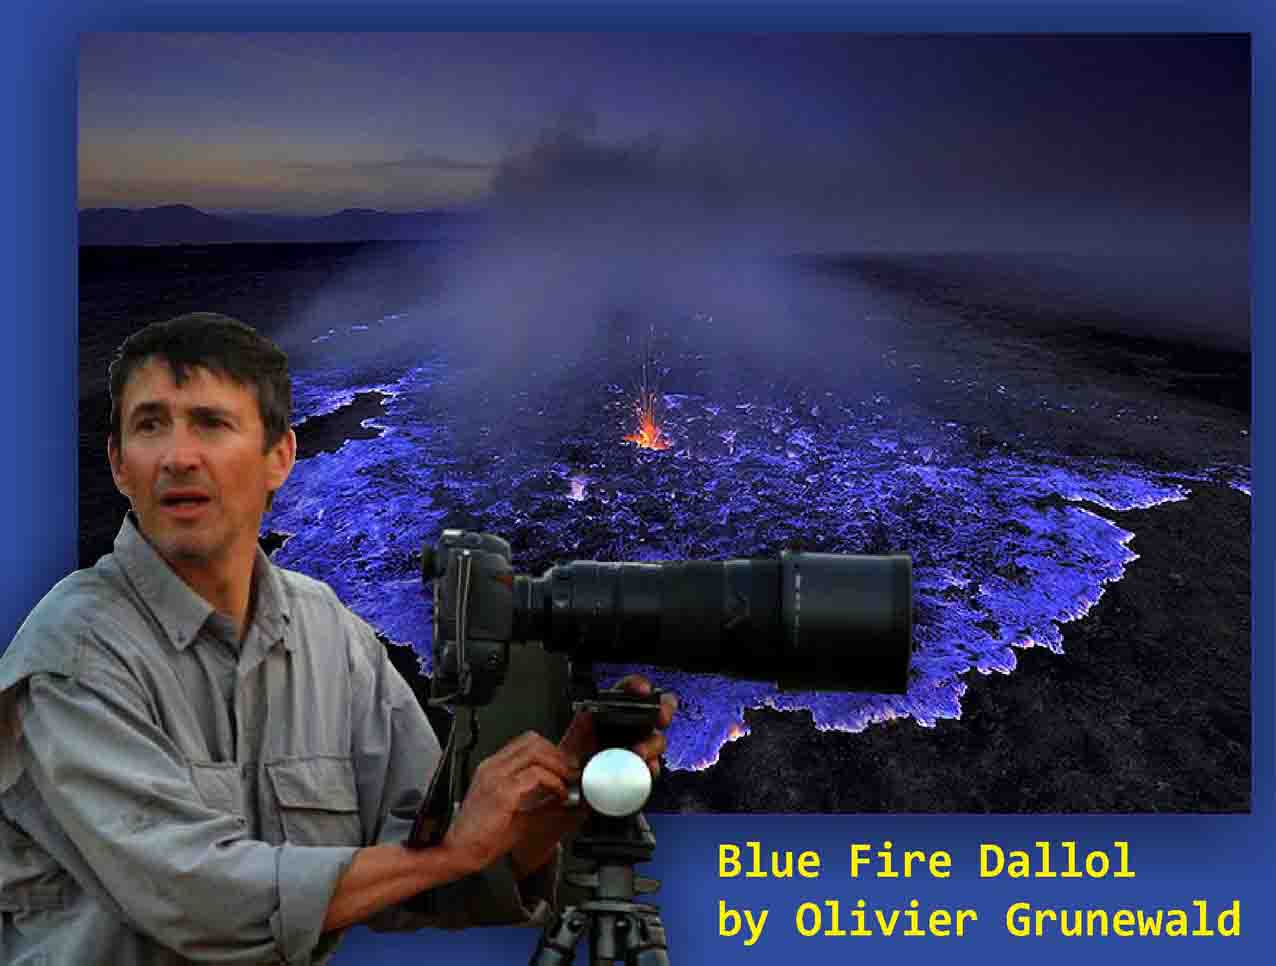 Blue Fire Dallol Danakil Depression, Olivier Grunewald, ada berapa blue fire di dunia, hoax blue fire Kawah Ijen